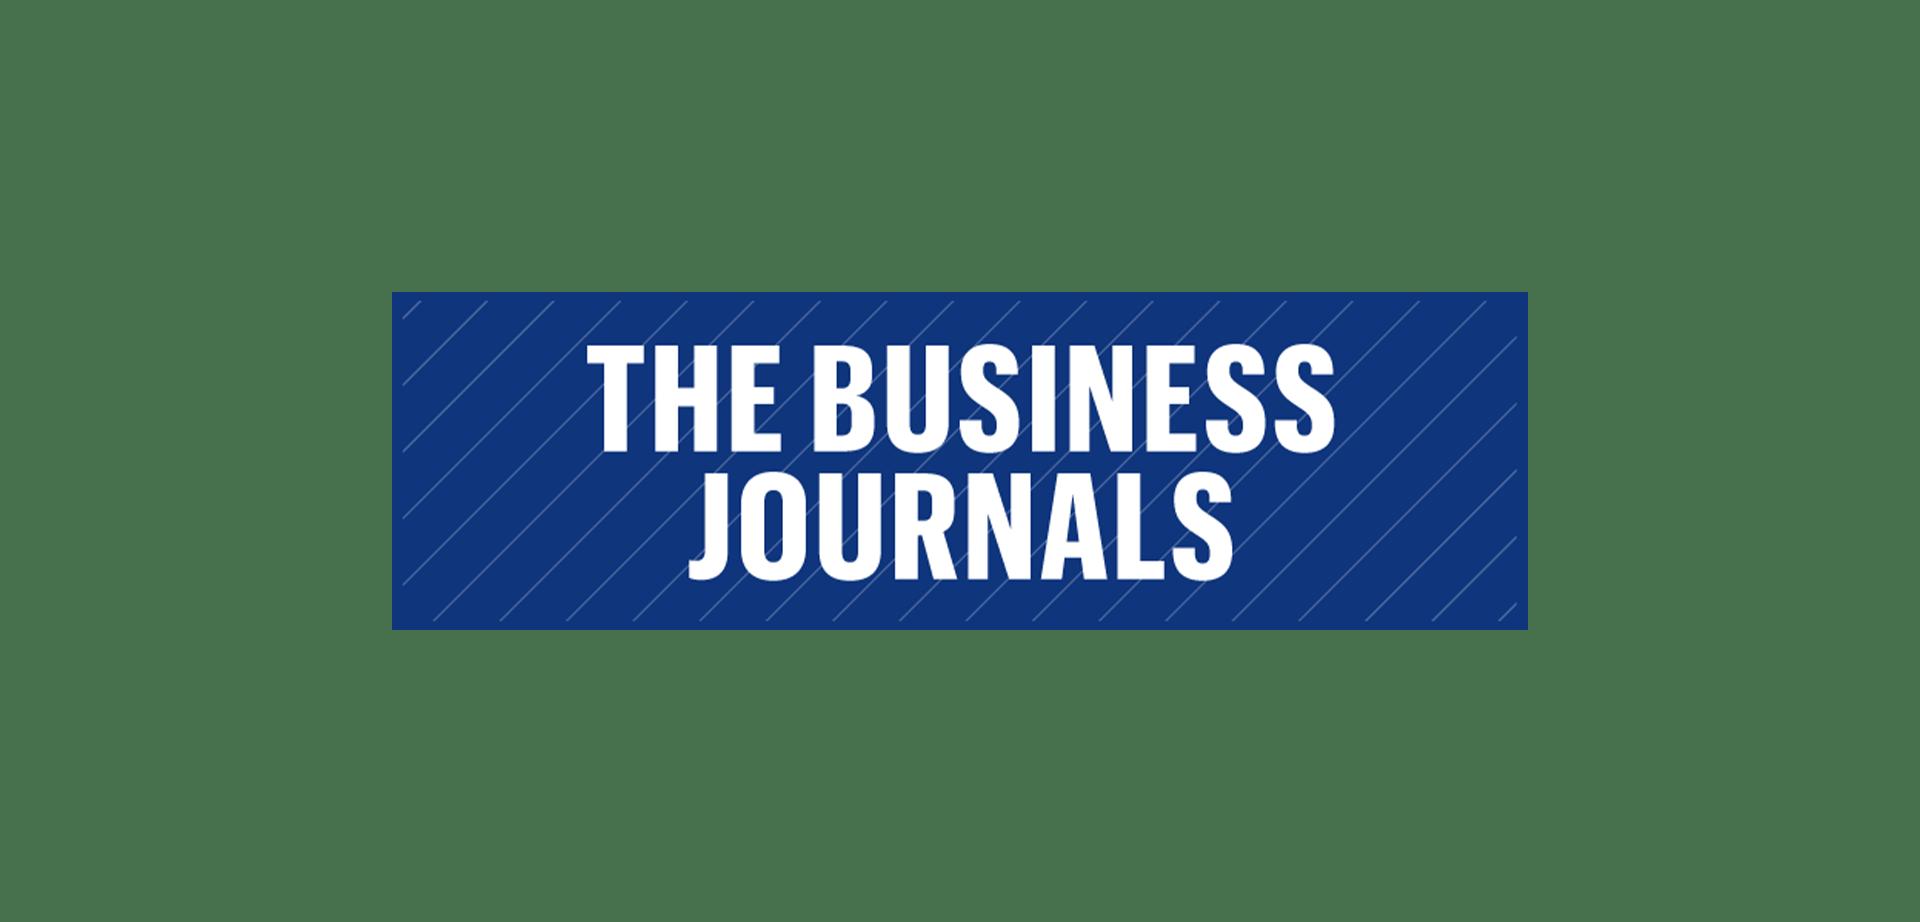 https://eabuck.com/wp-content/uploads/2021/05/smallbusjournal.png